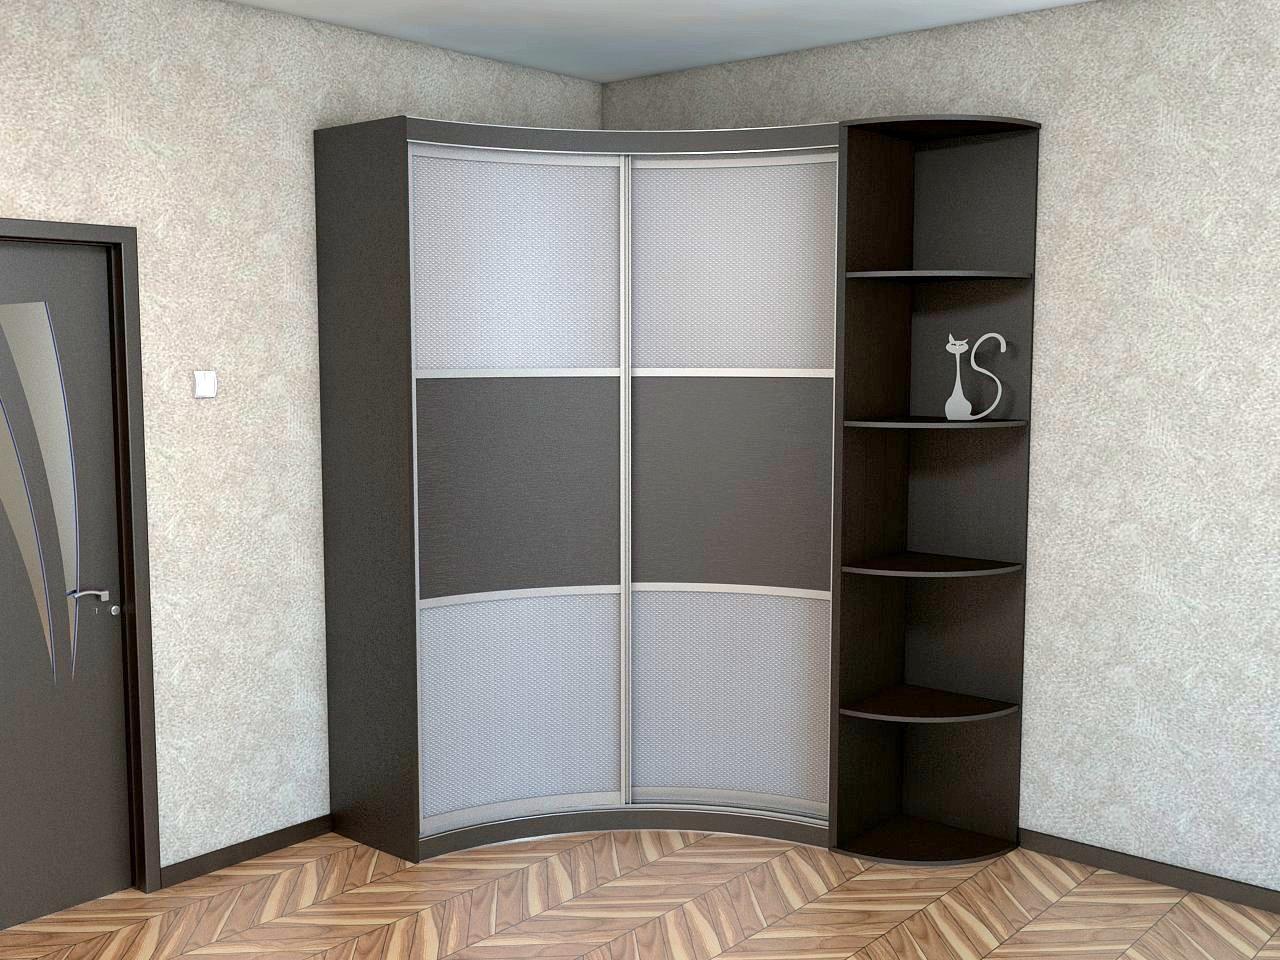 Шкаф-купе 8 kvd мебель на заказ.